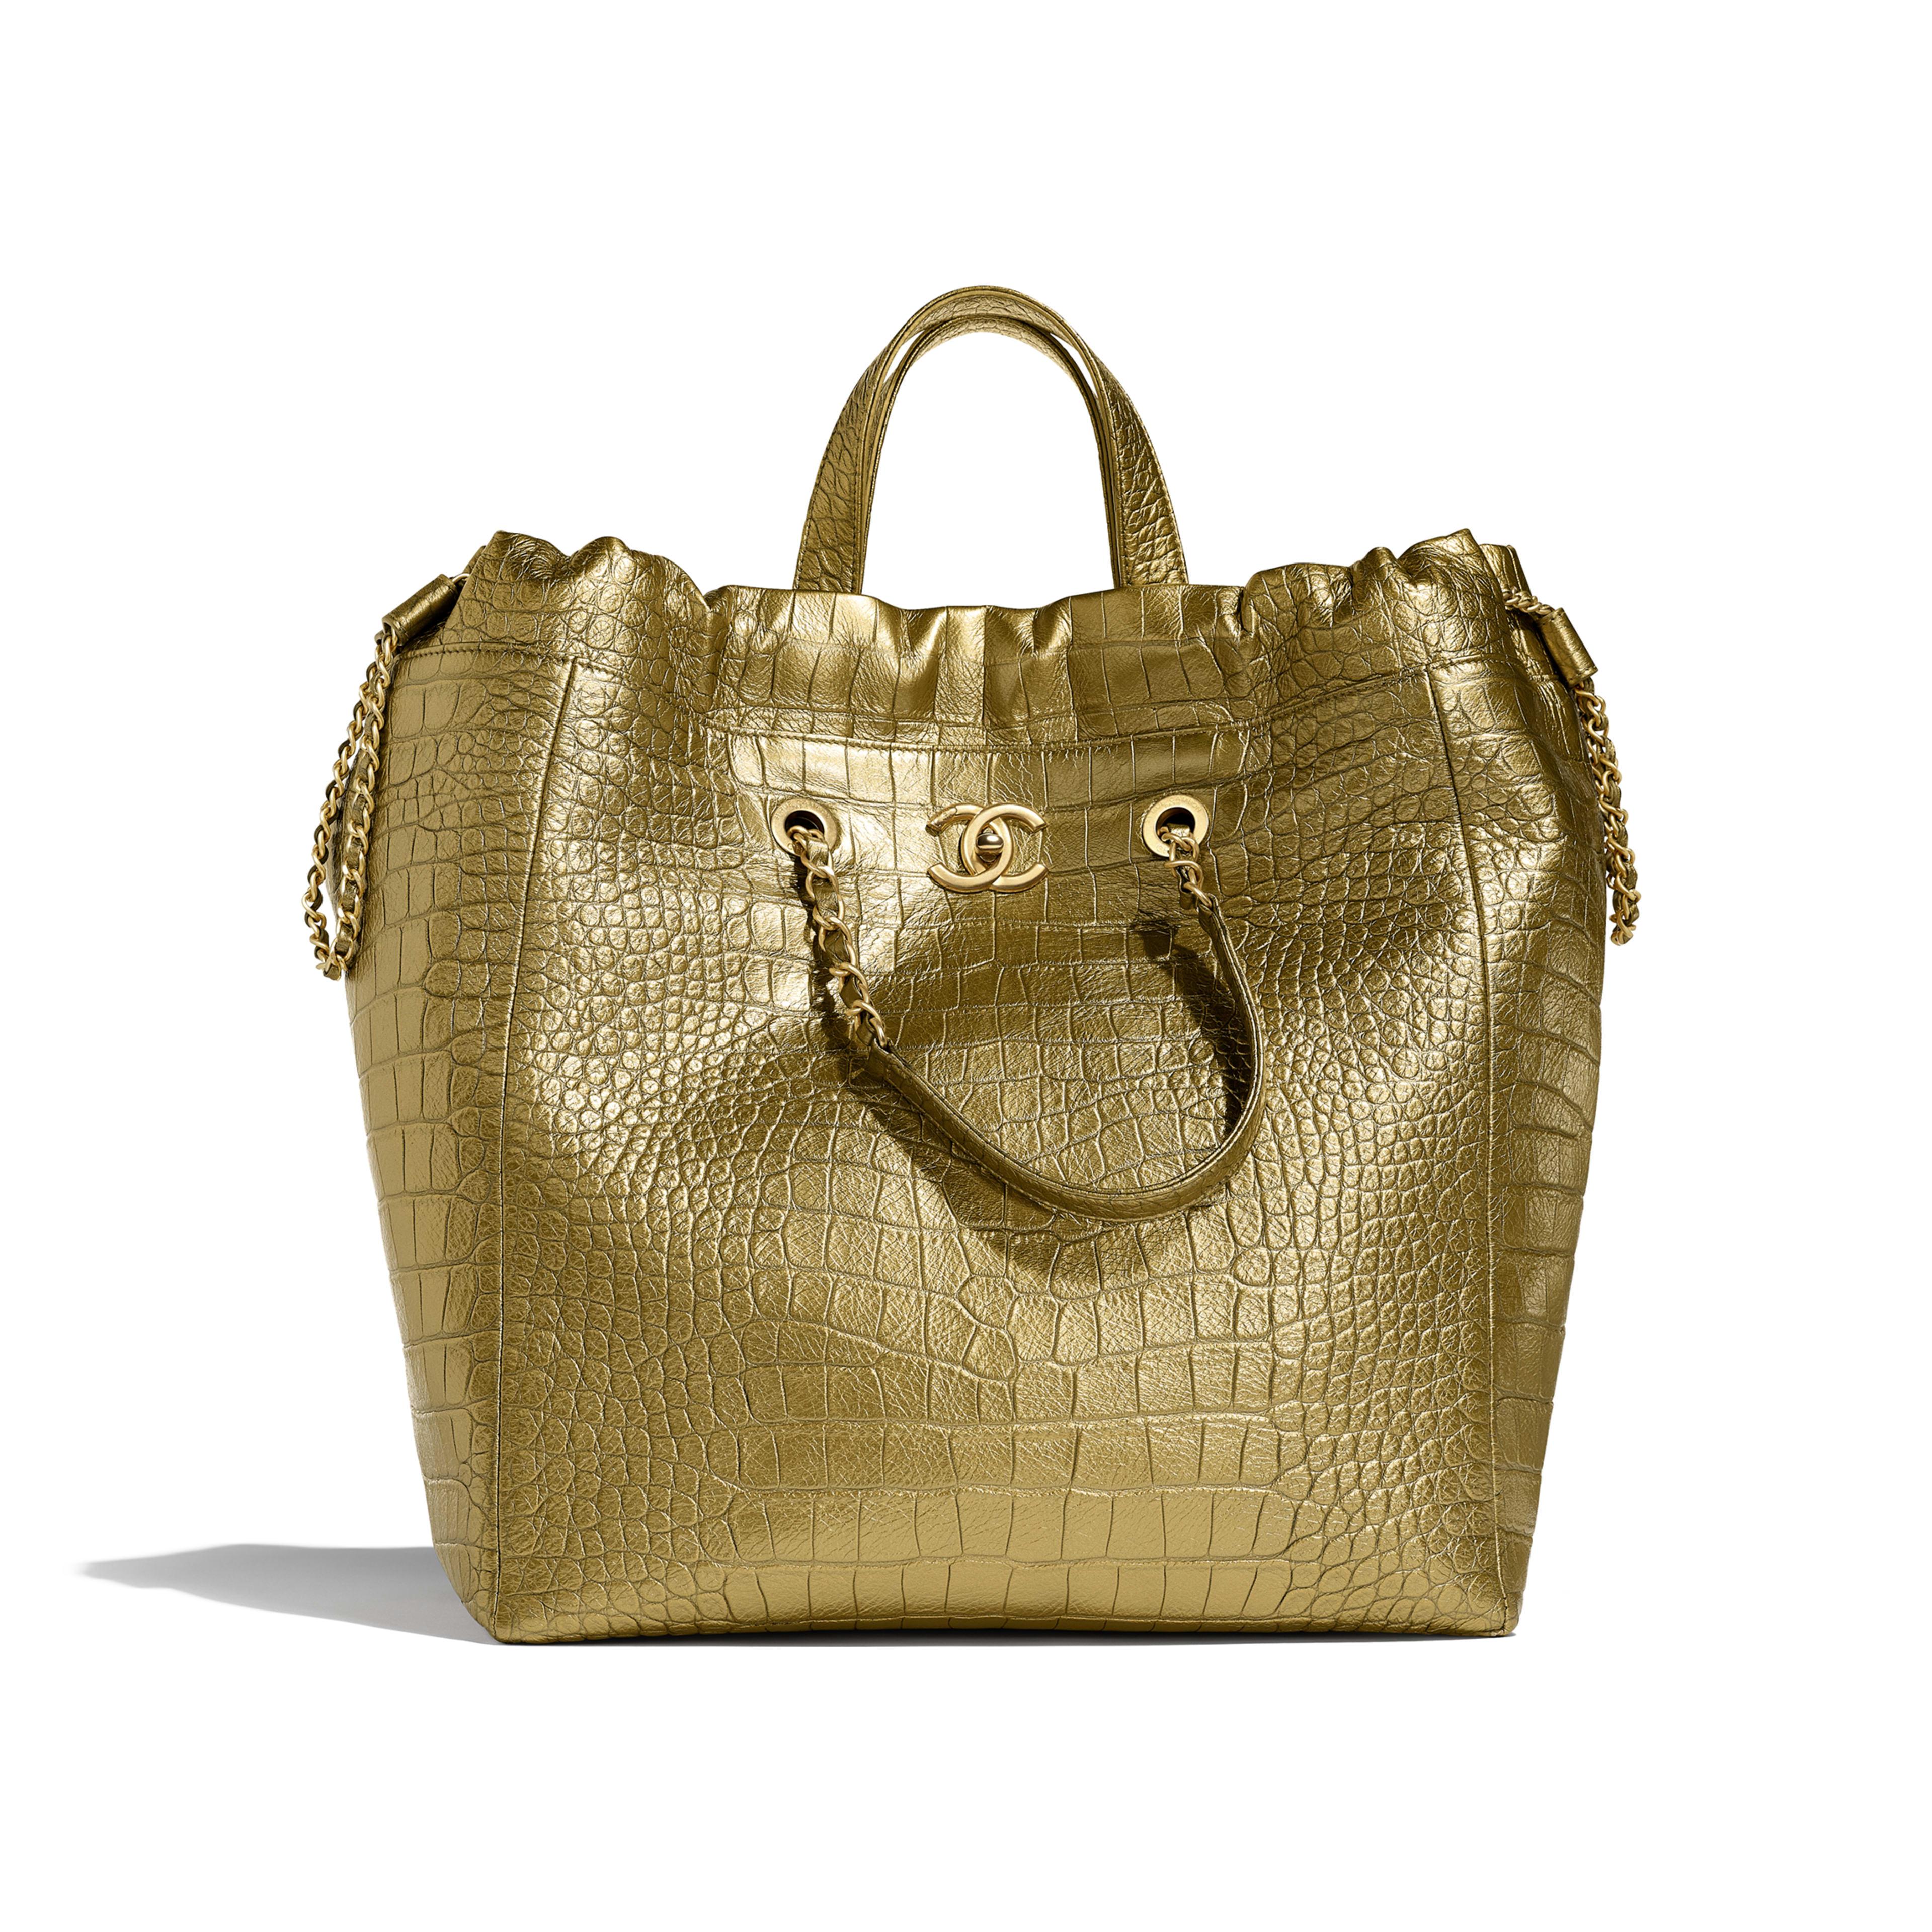 Large Shopping Bag - Gold - Metallic Crocodile Embossed Calfskin & Gold Metal - Default view - see full sized version